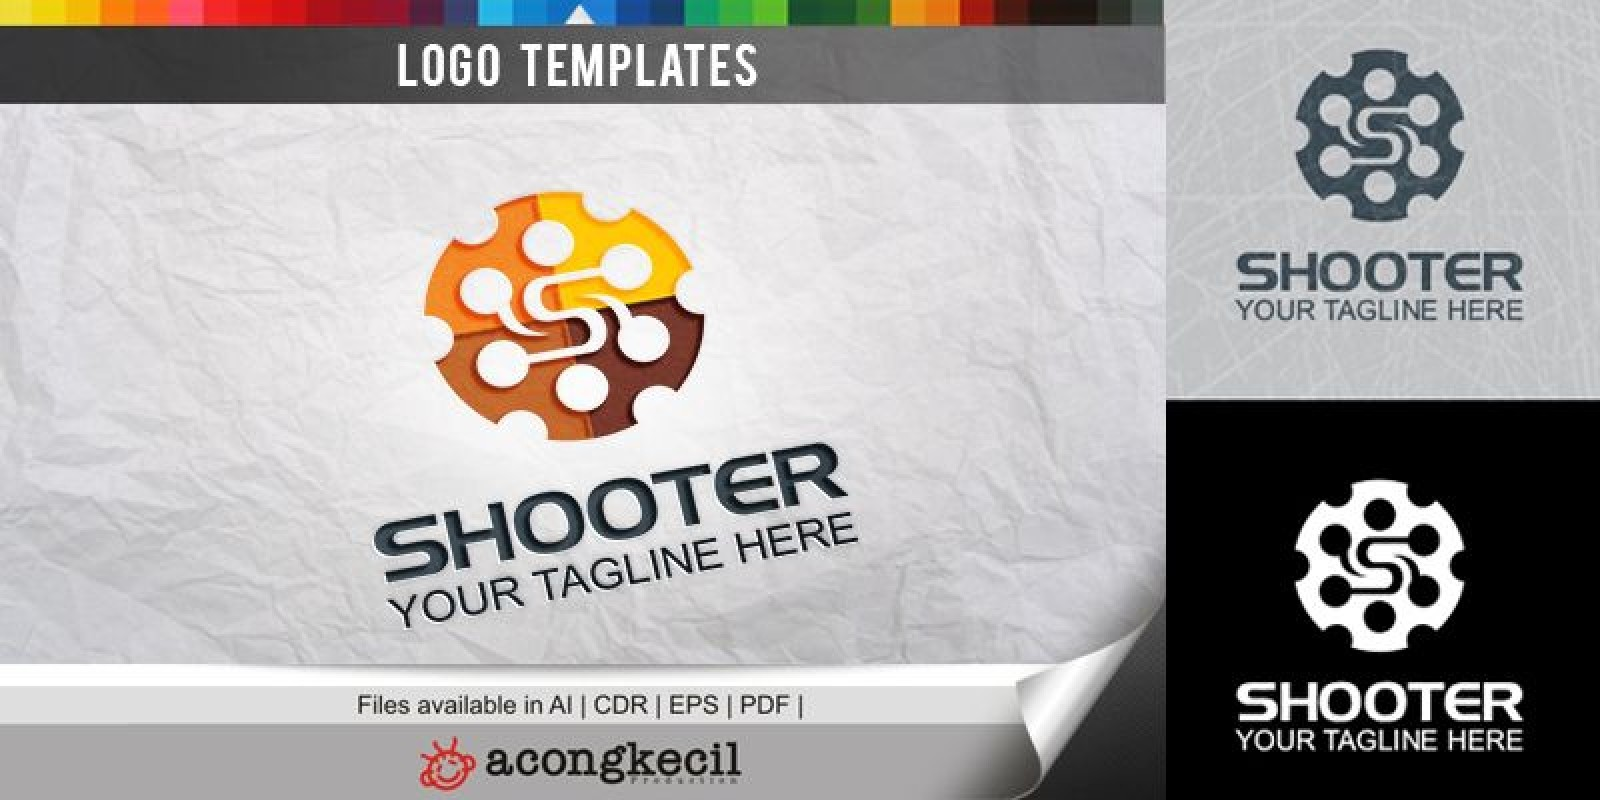 Shooter - Logo Template